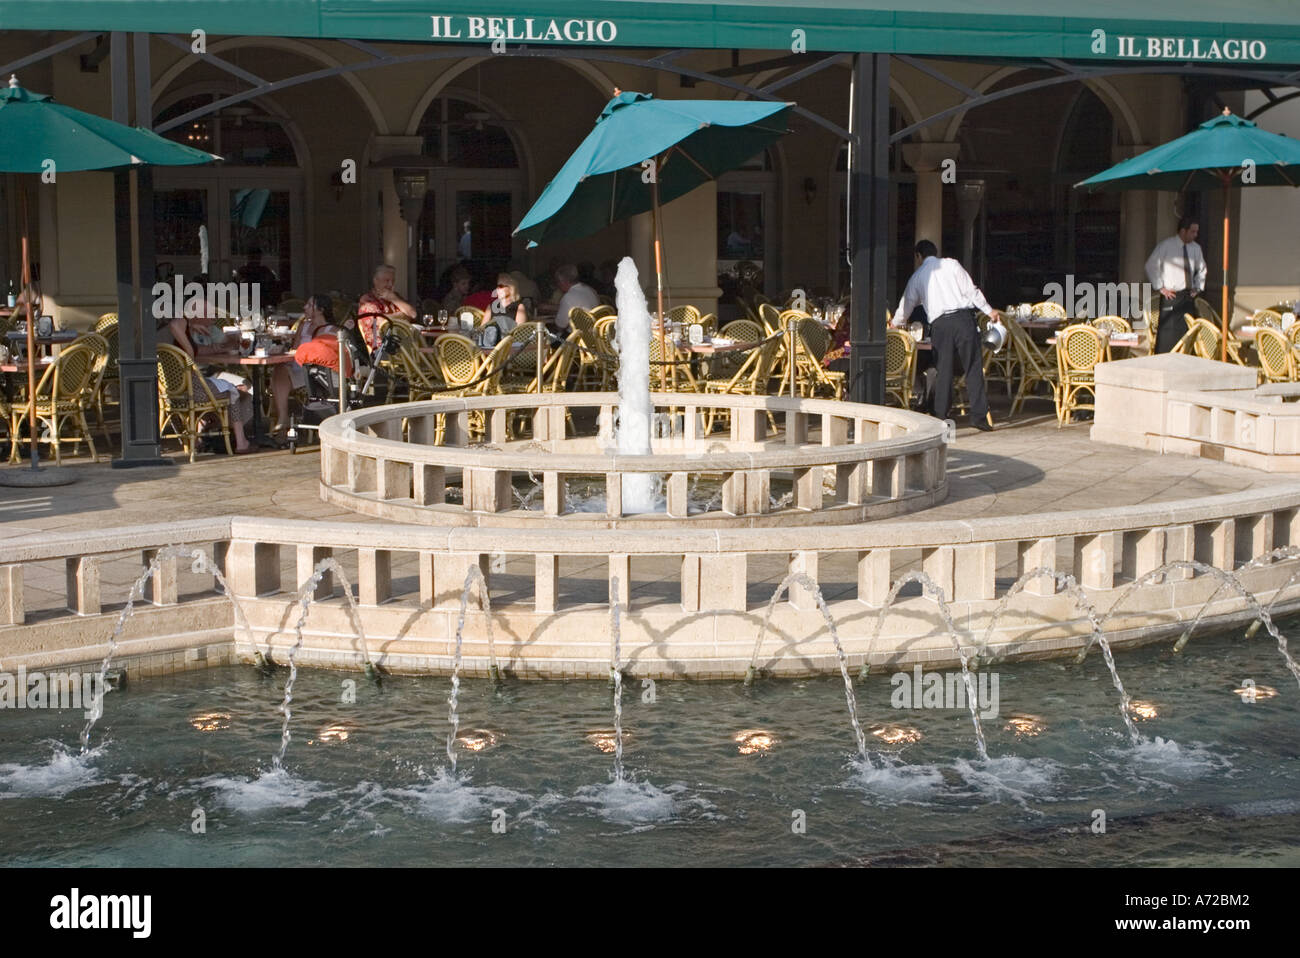 Closeup Of Fountain In Front Of Il Bellagio Restaurant City